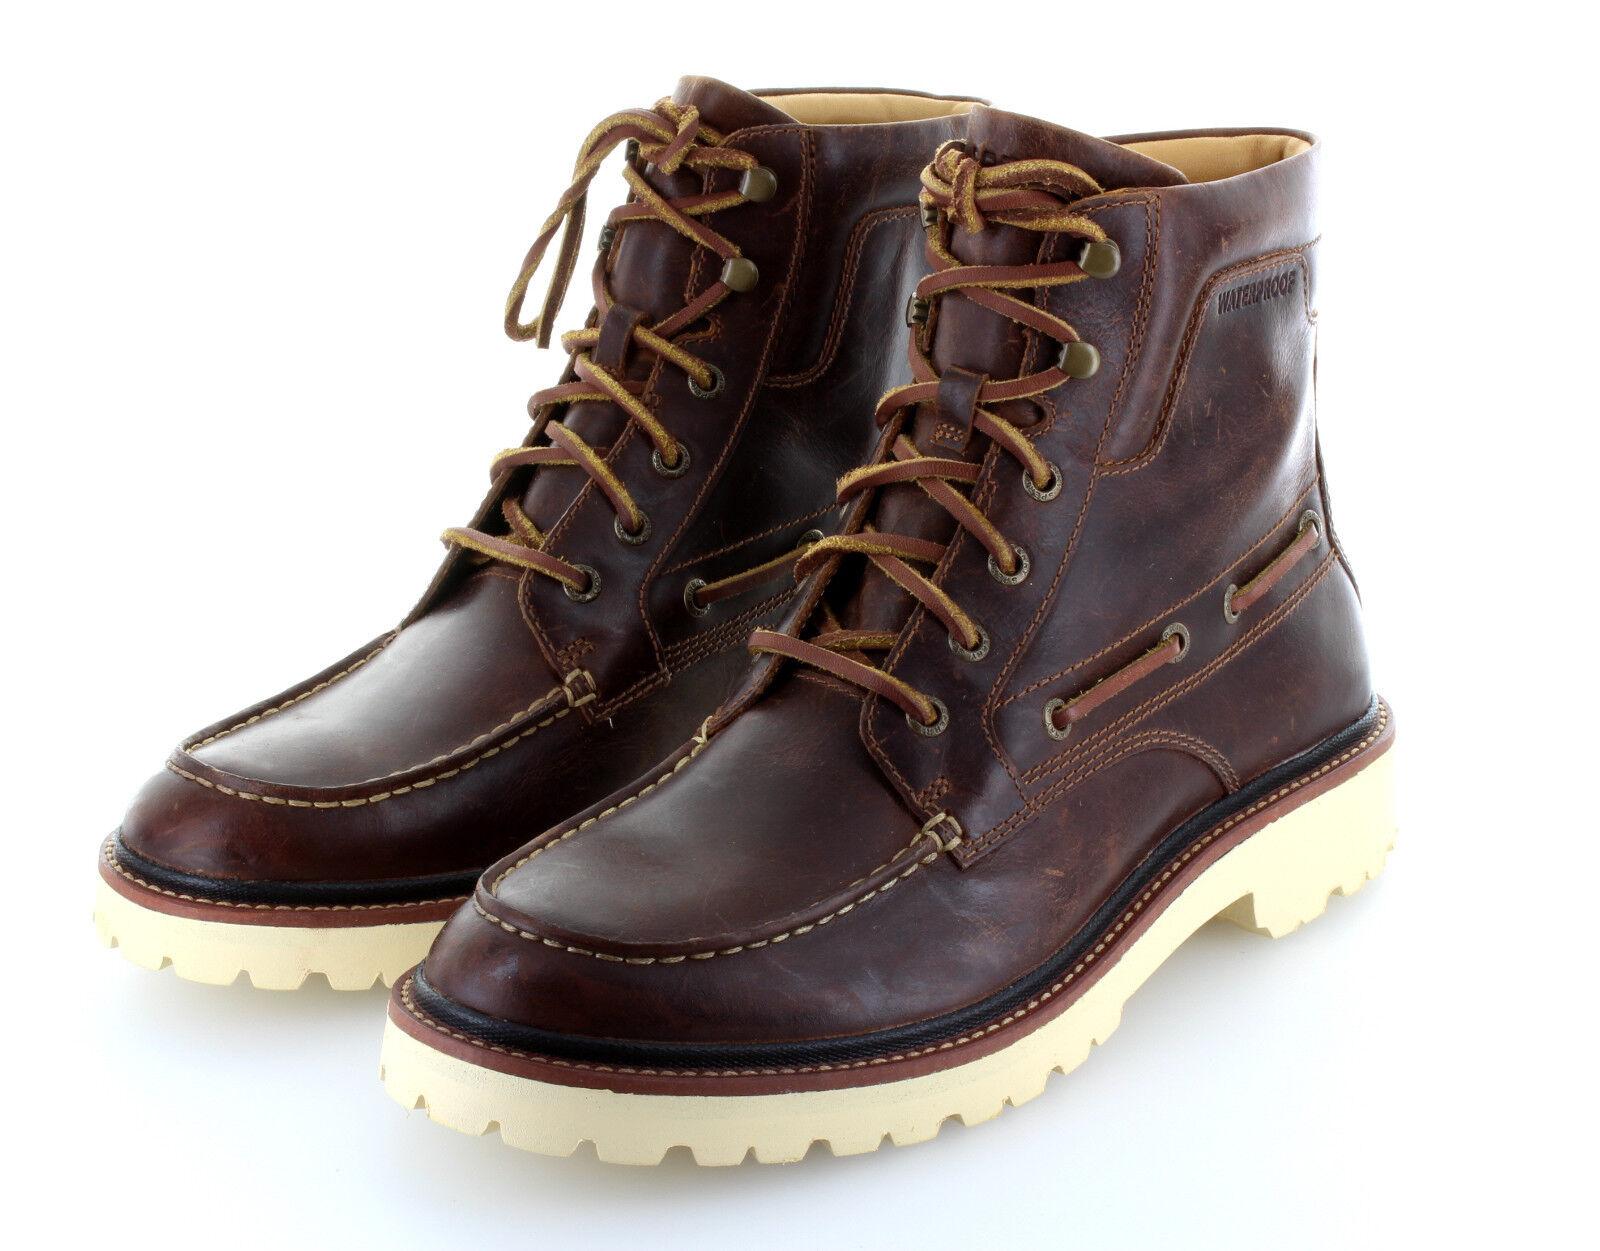 Sperry Top Sider Gold Luc Moc Tan Stiefel Stiefel Leder Schuhe Gr. 42   US 9